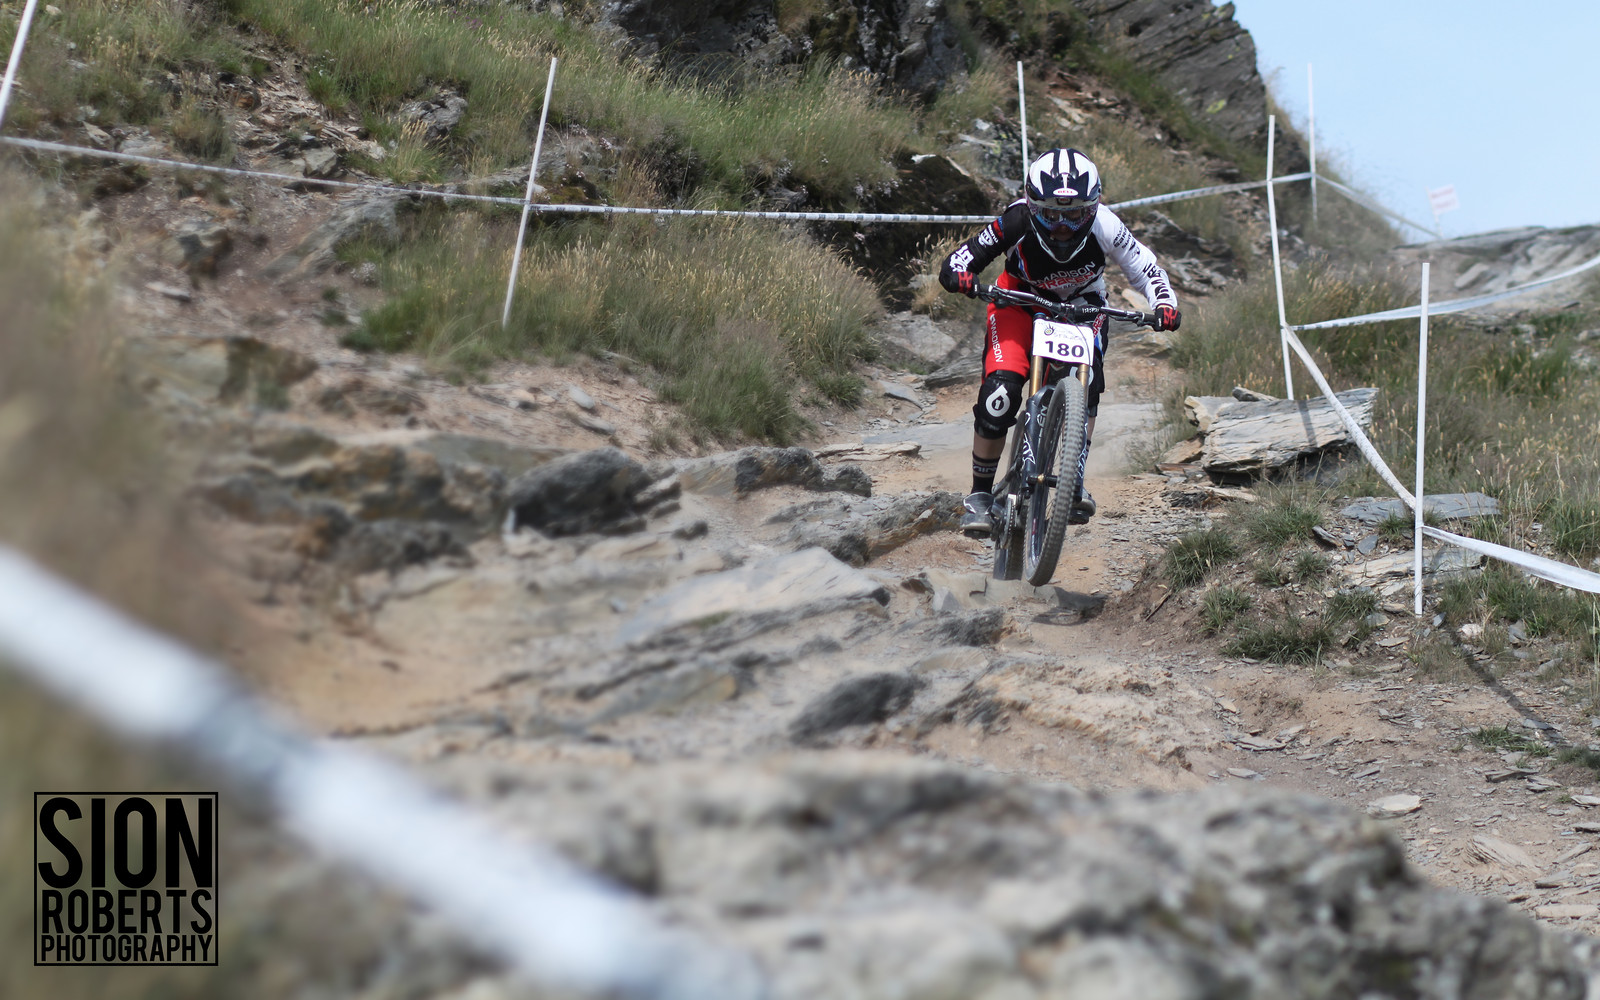 Mannon Carpenter  - sionr644 - Mountain Biking Pictures - Vital MTB